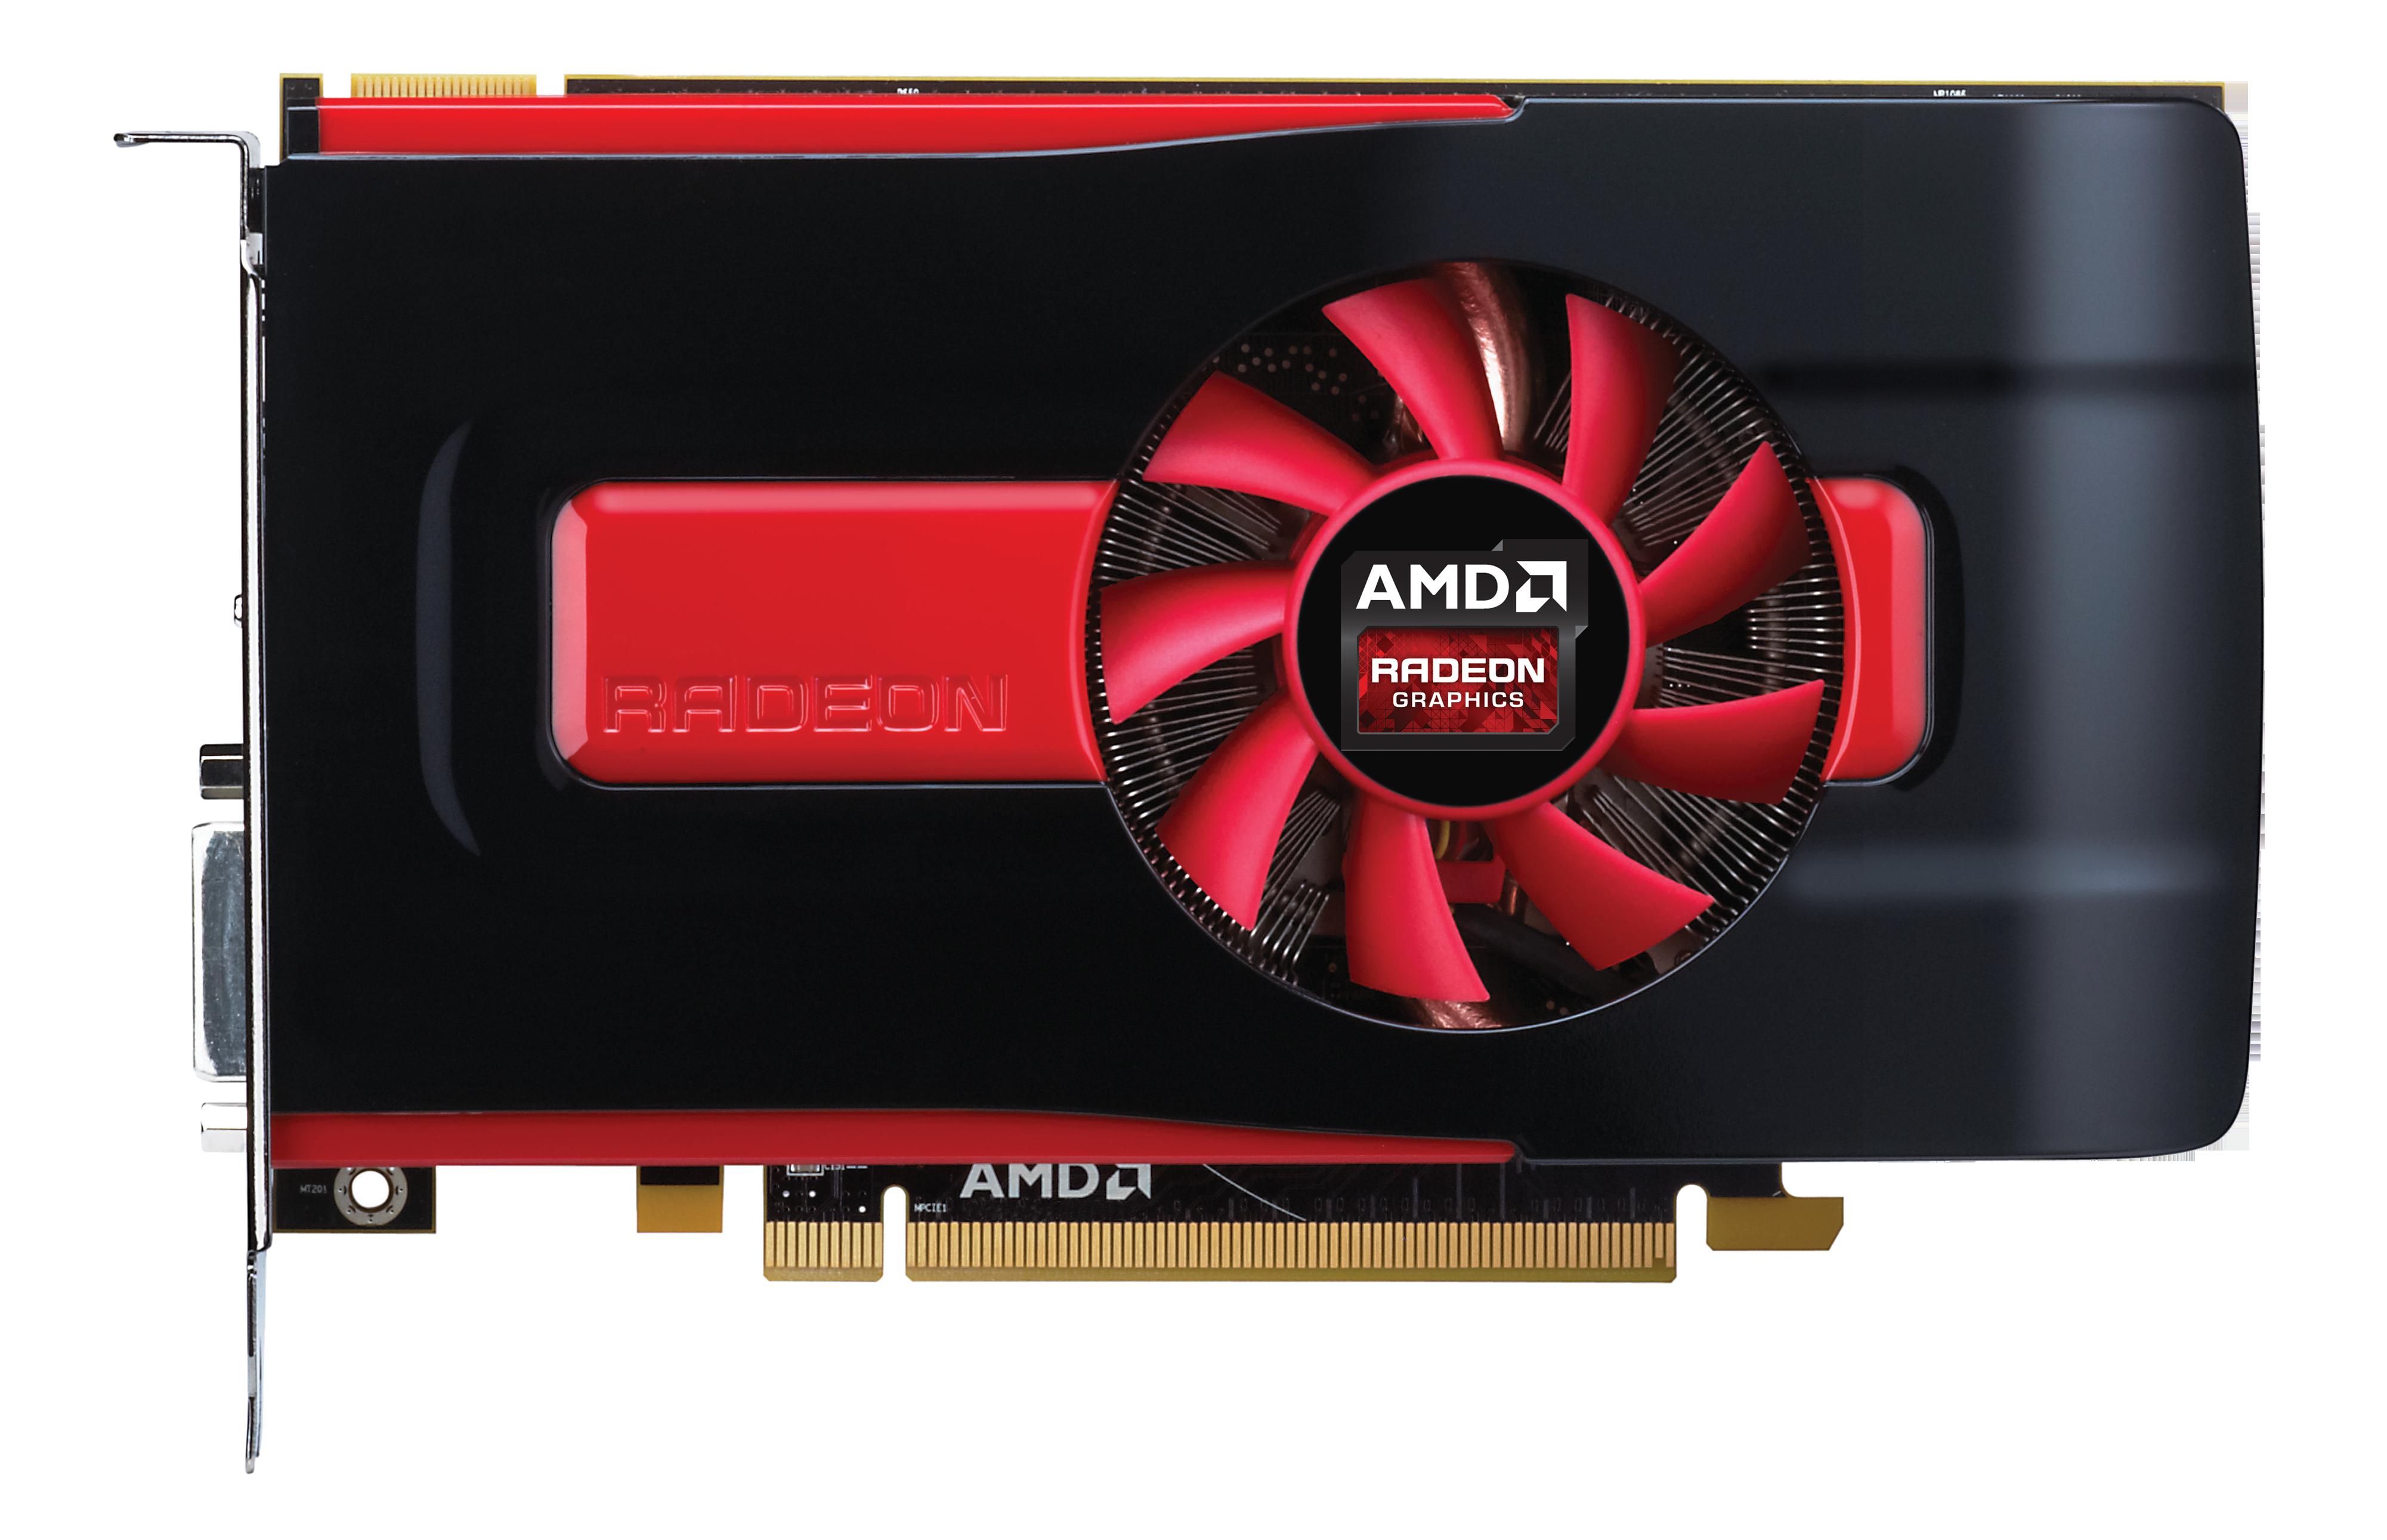 AMD Radeon HD 7600M series: характеристики и обзор